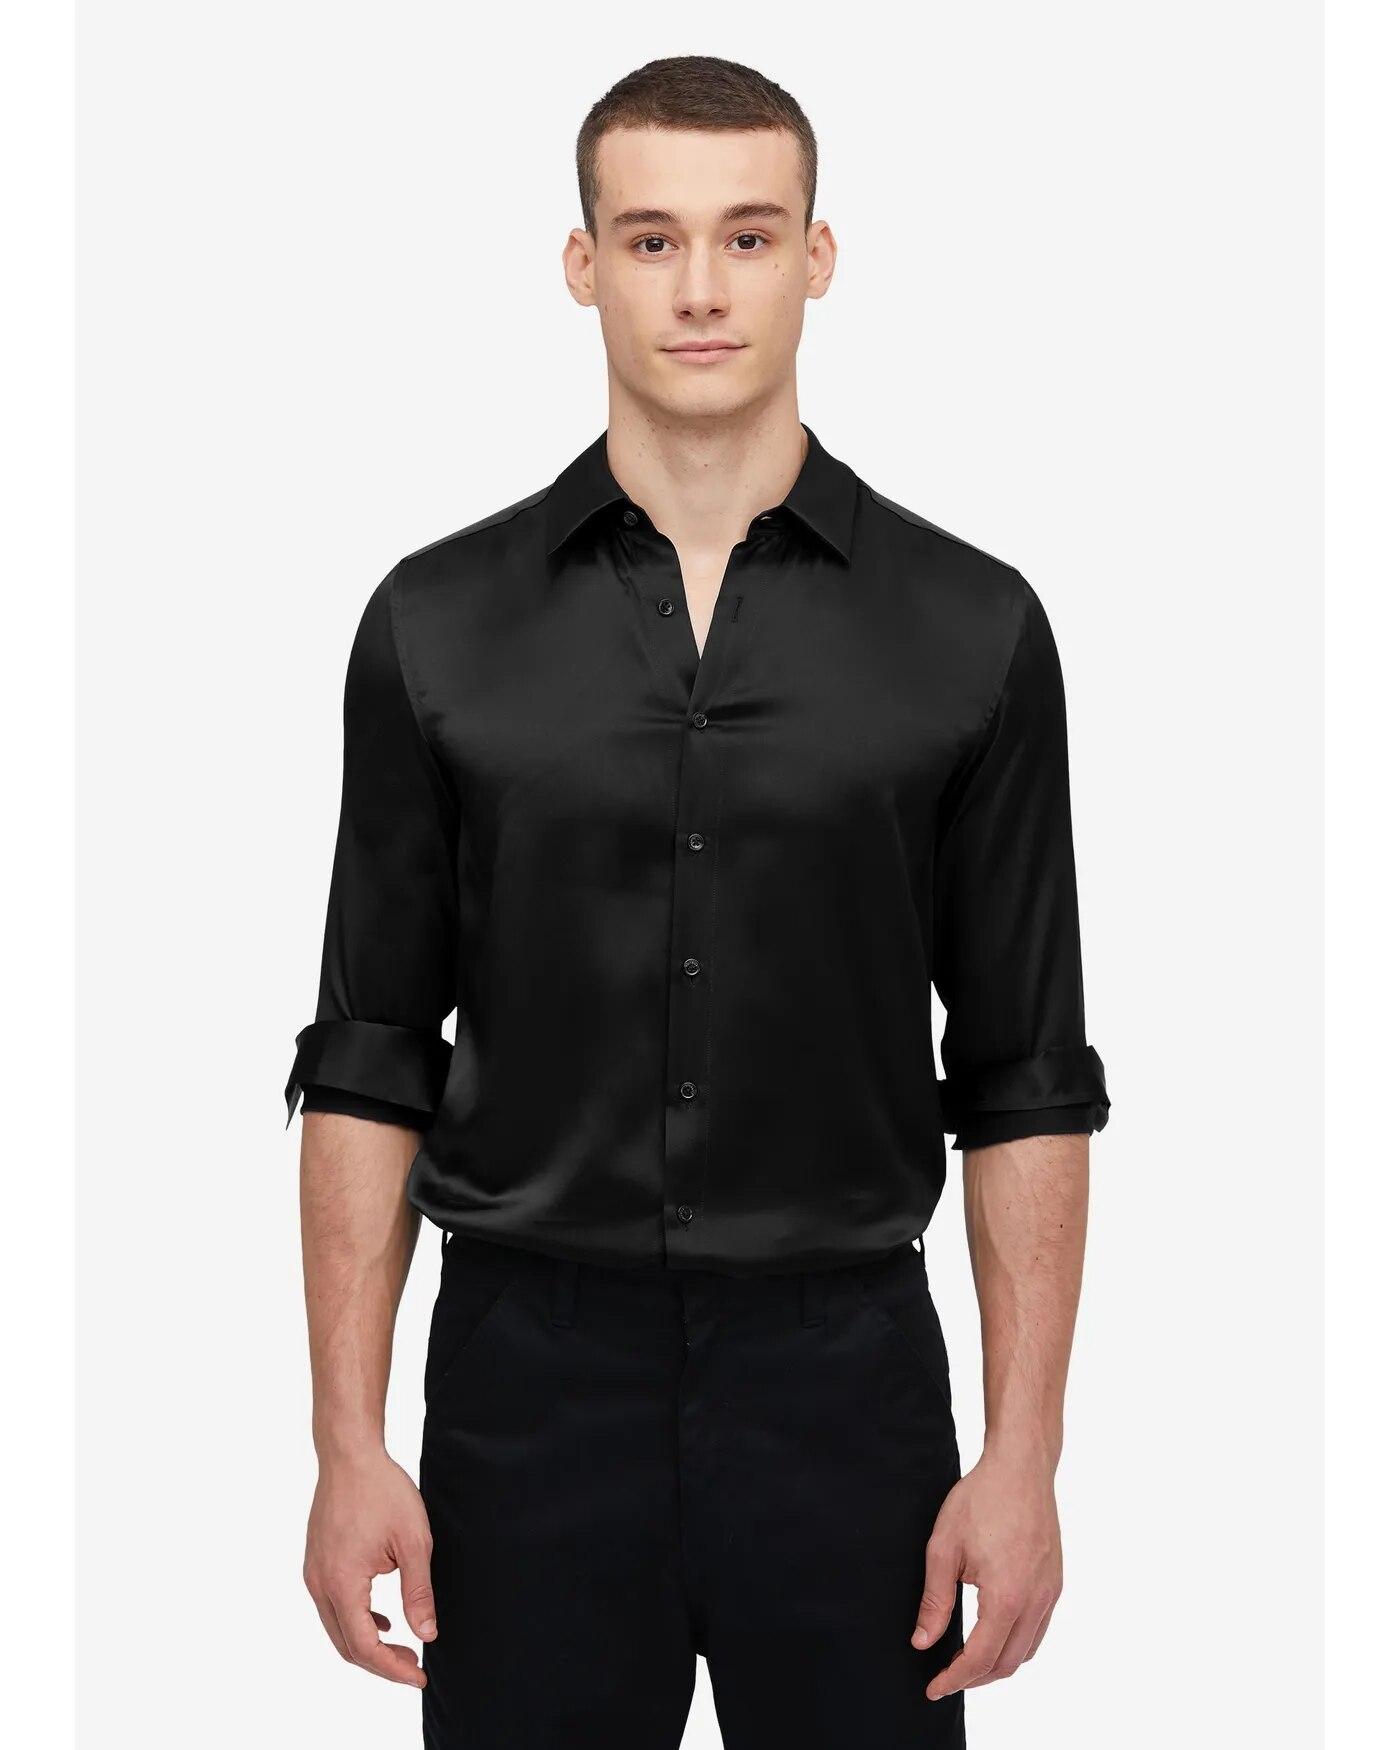 19MM Mulberry Silk Basic Mens Shirt